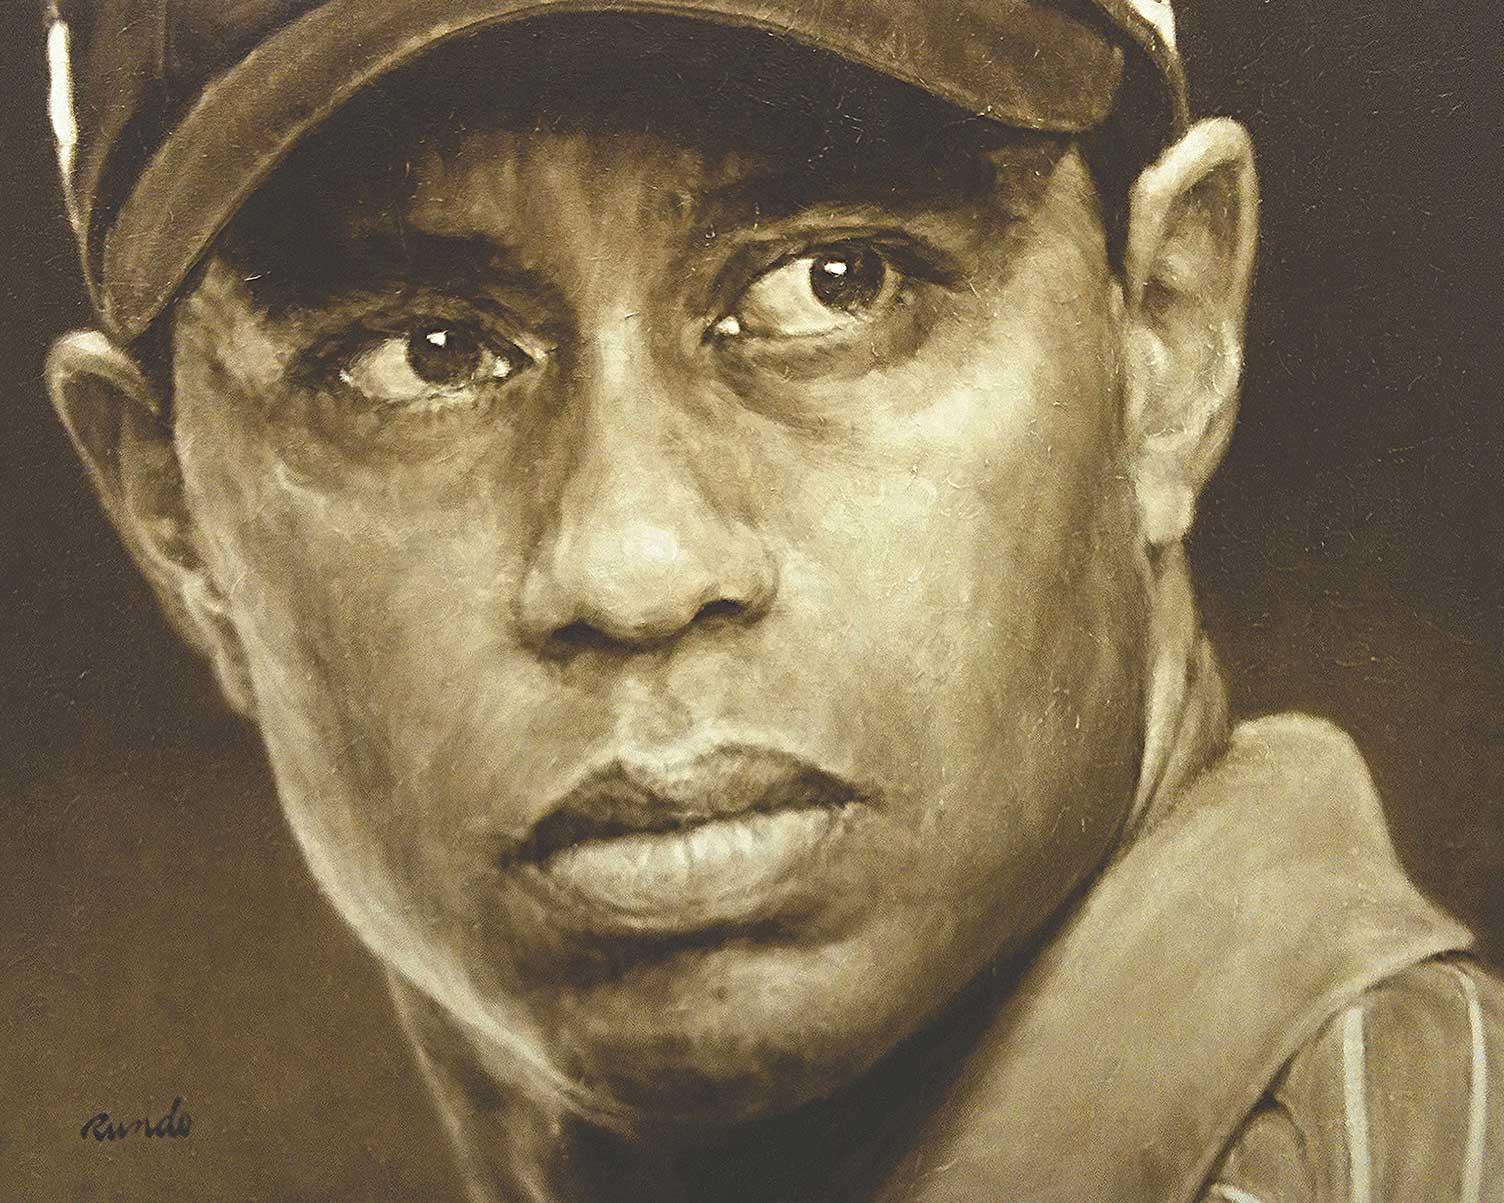 Ron Rundo / Tiger Woods / Oil on Canvas